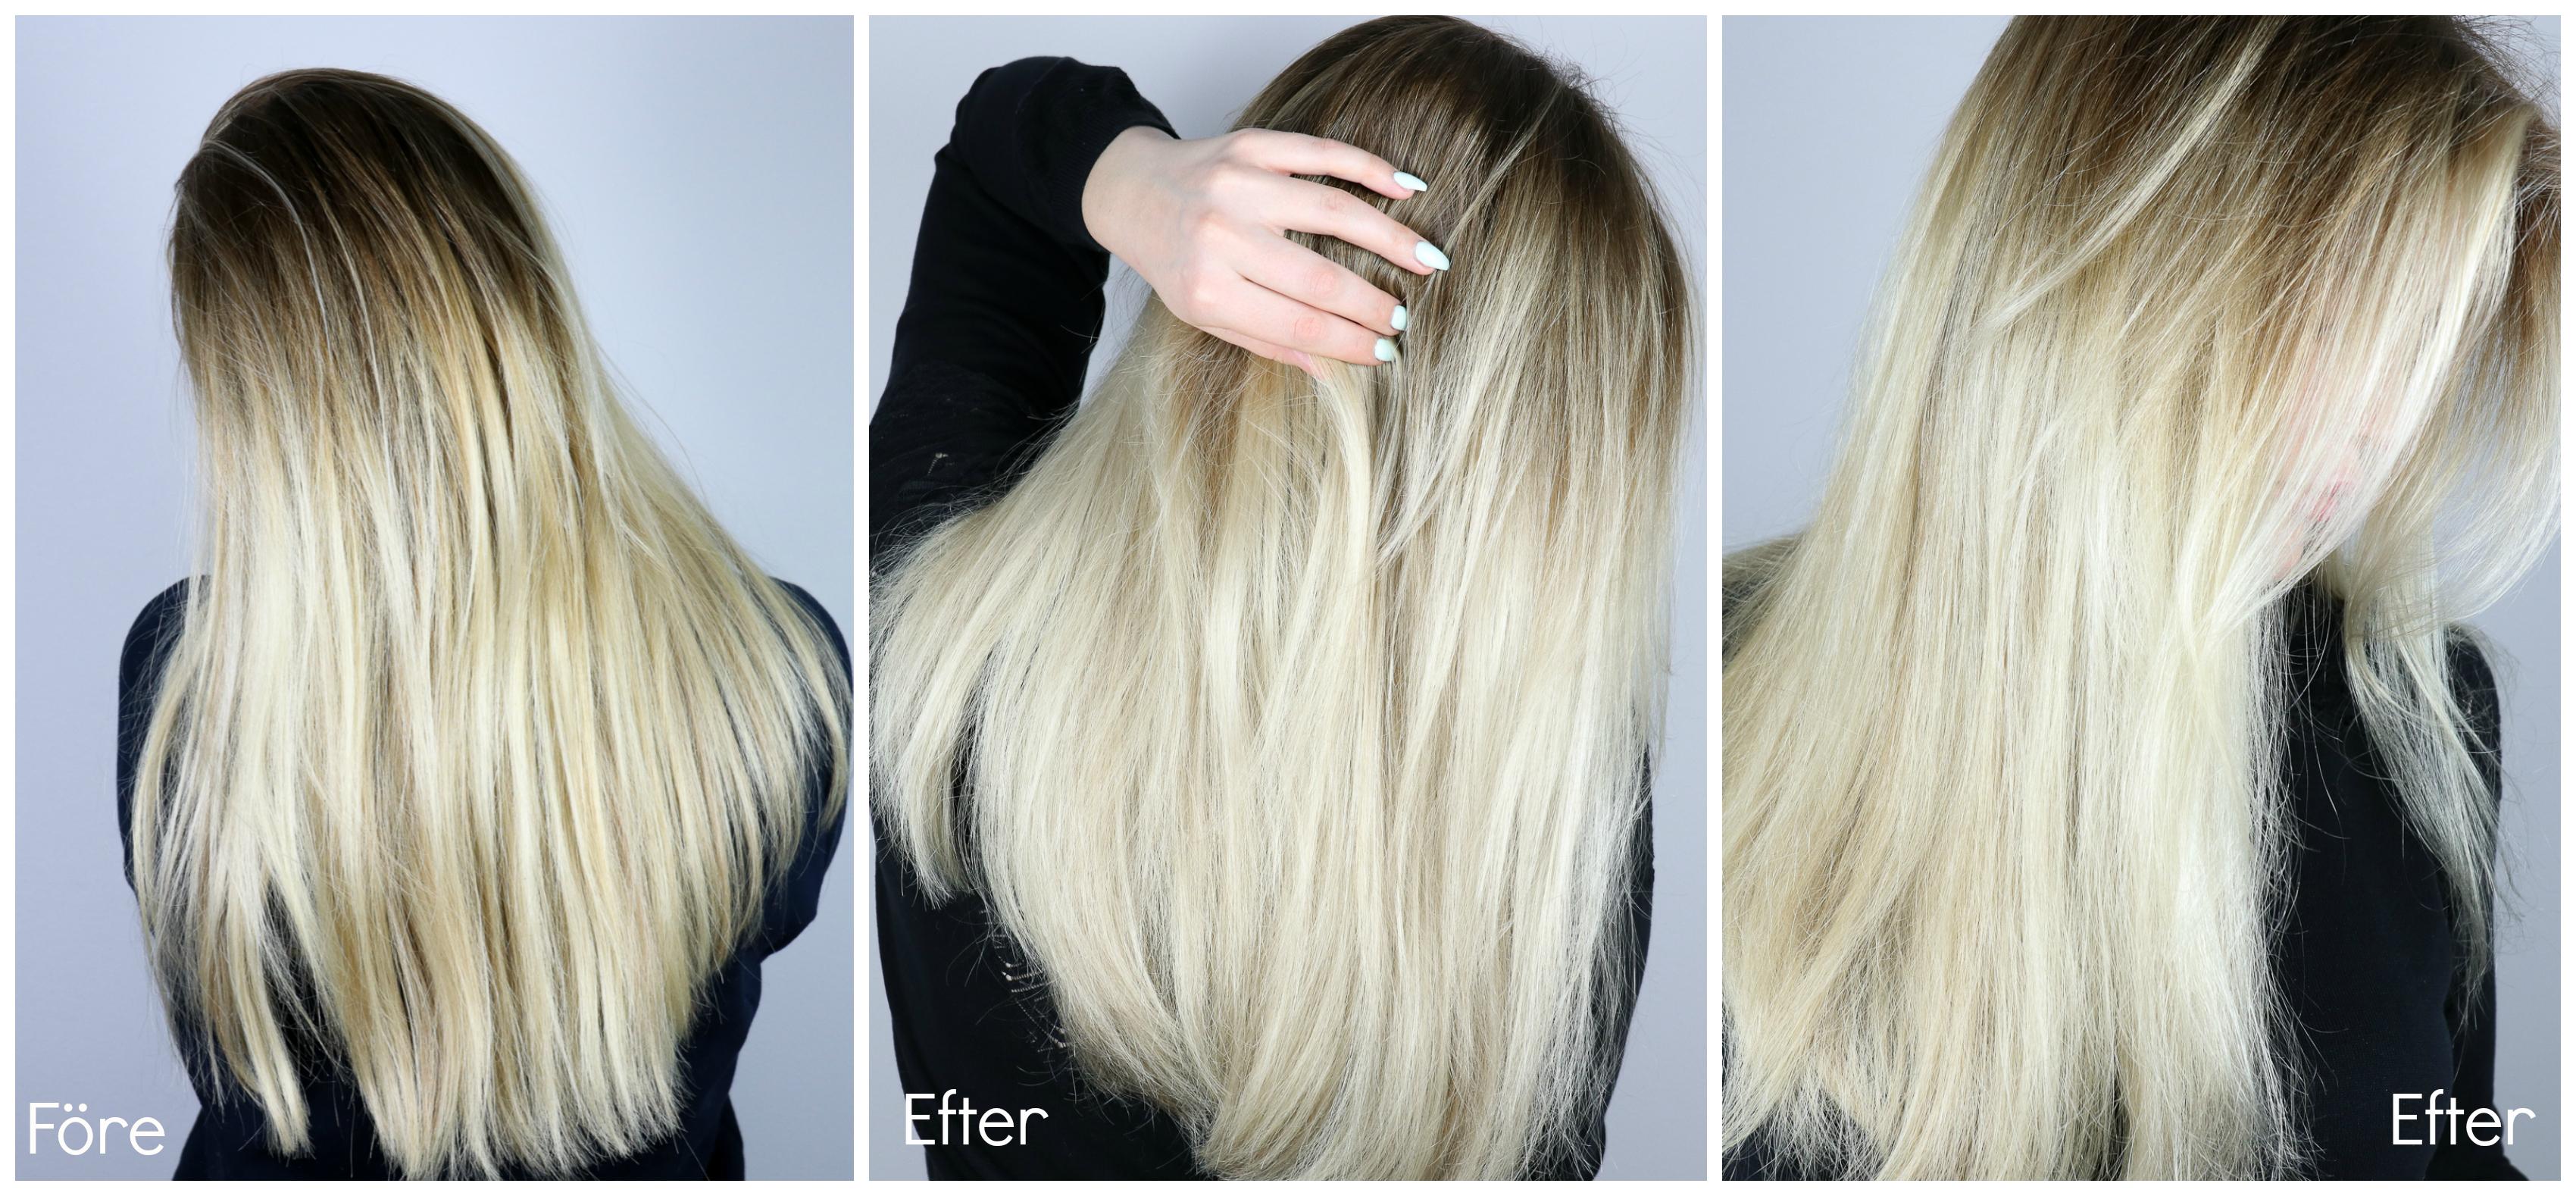 silvershampoo i torrt hår